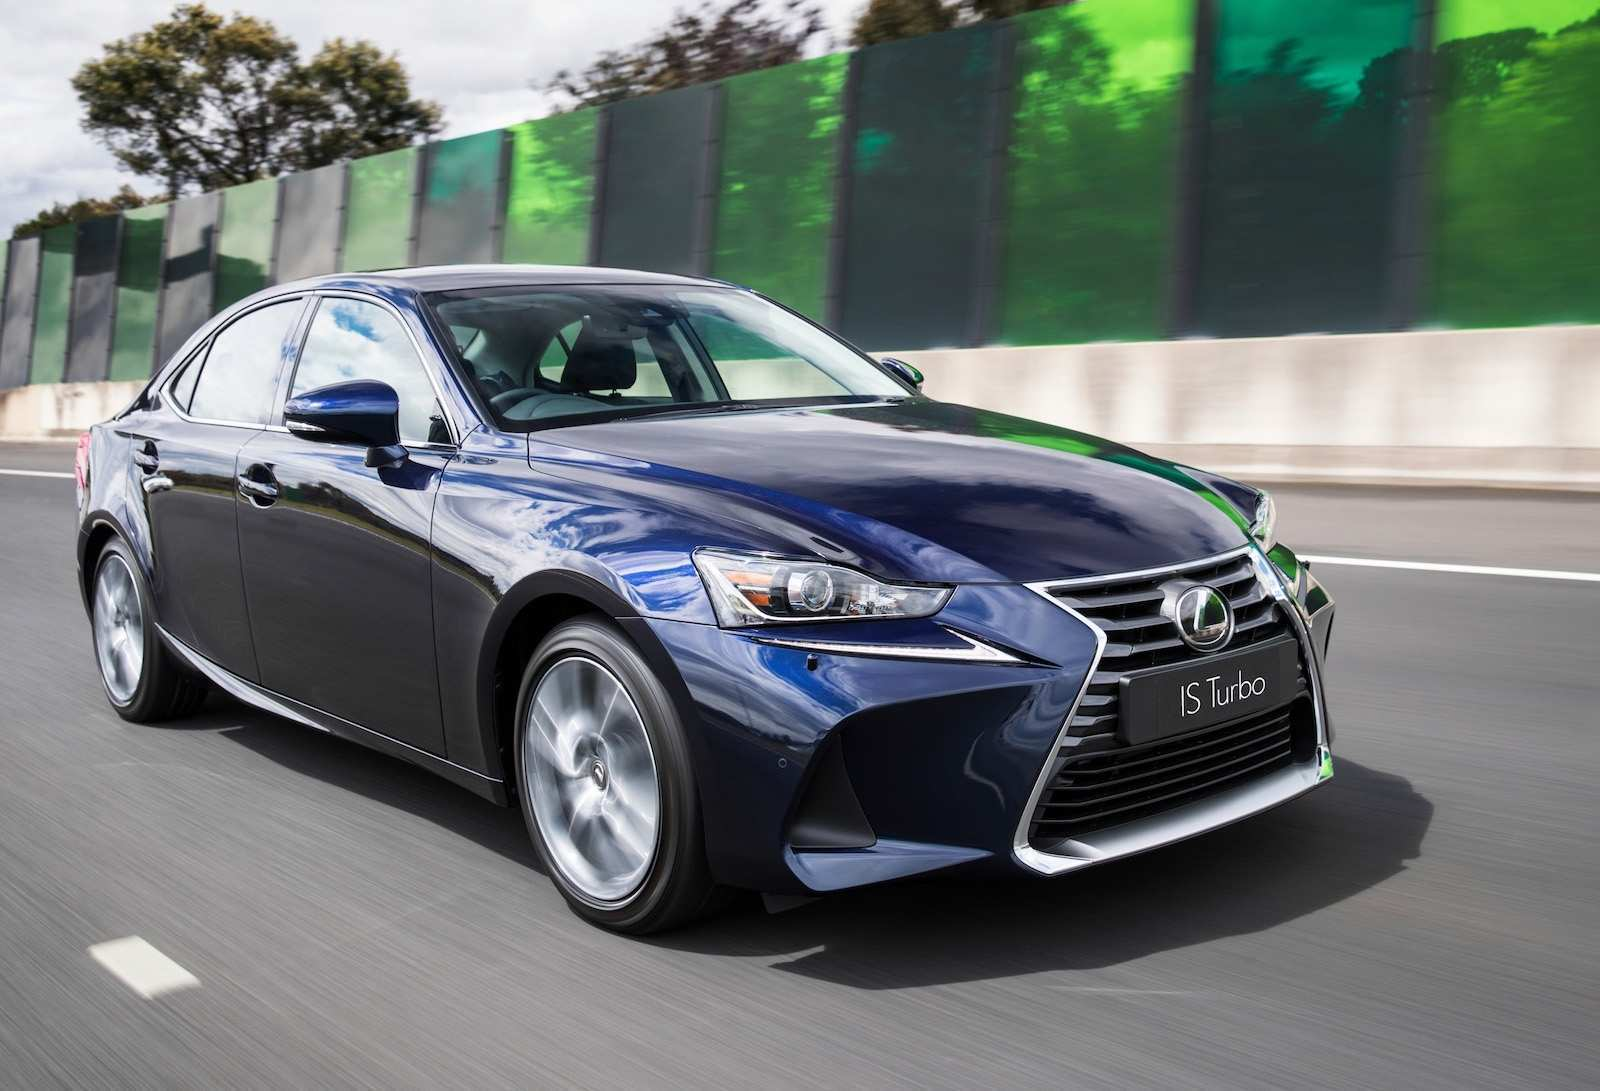 21 Concept of Lexus Es 2020 Exterior Ratings by Lexus Es 2020 Exterior